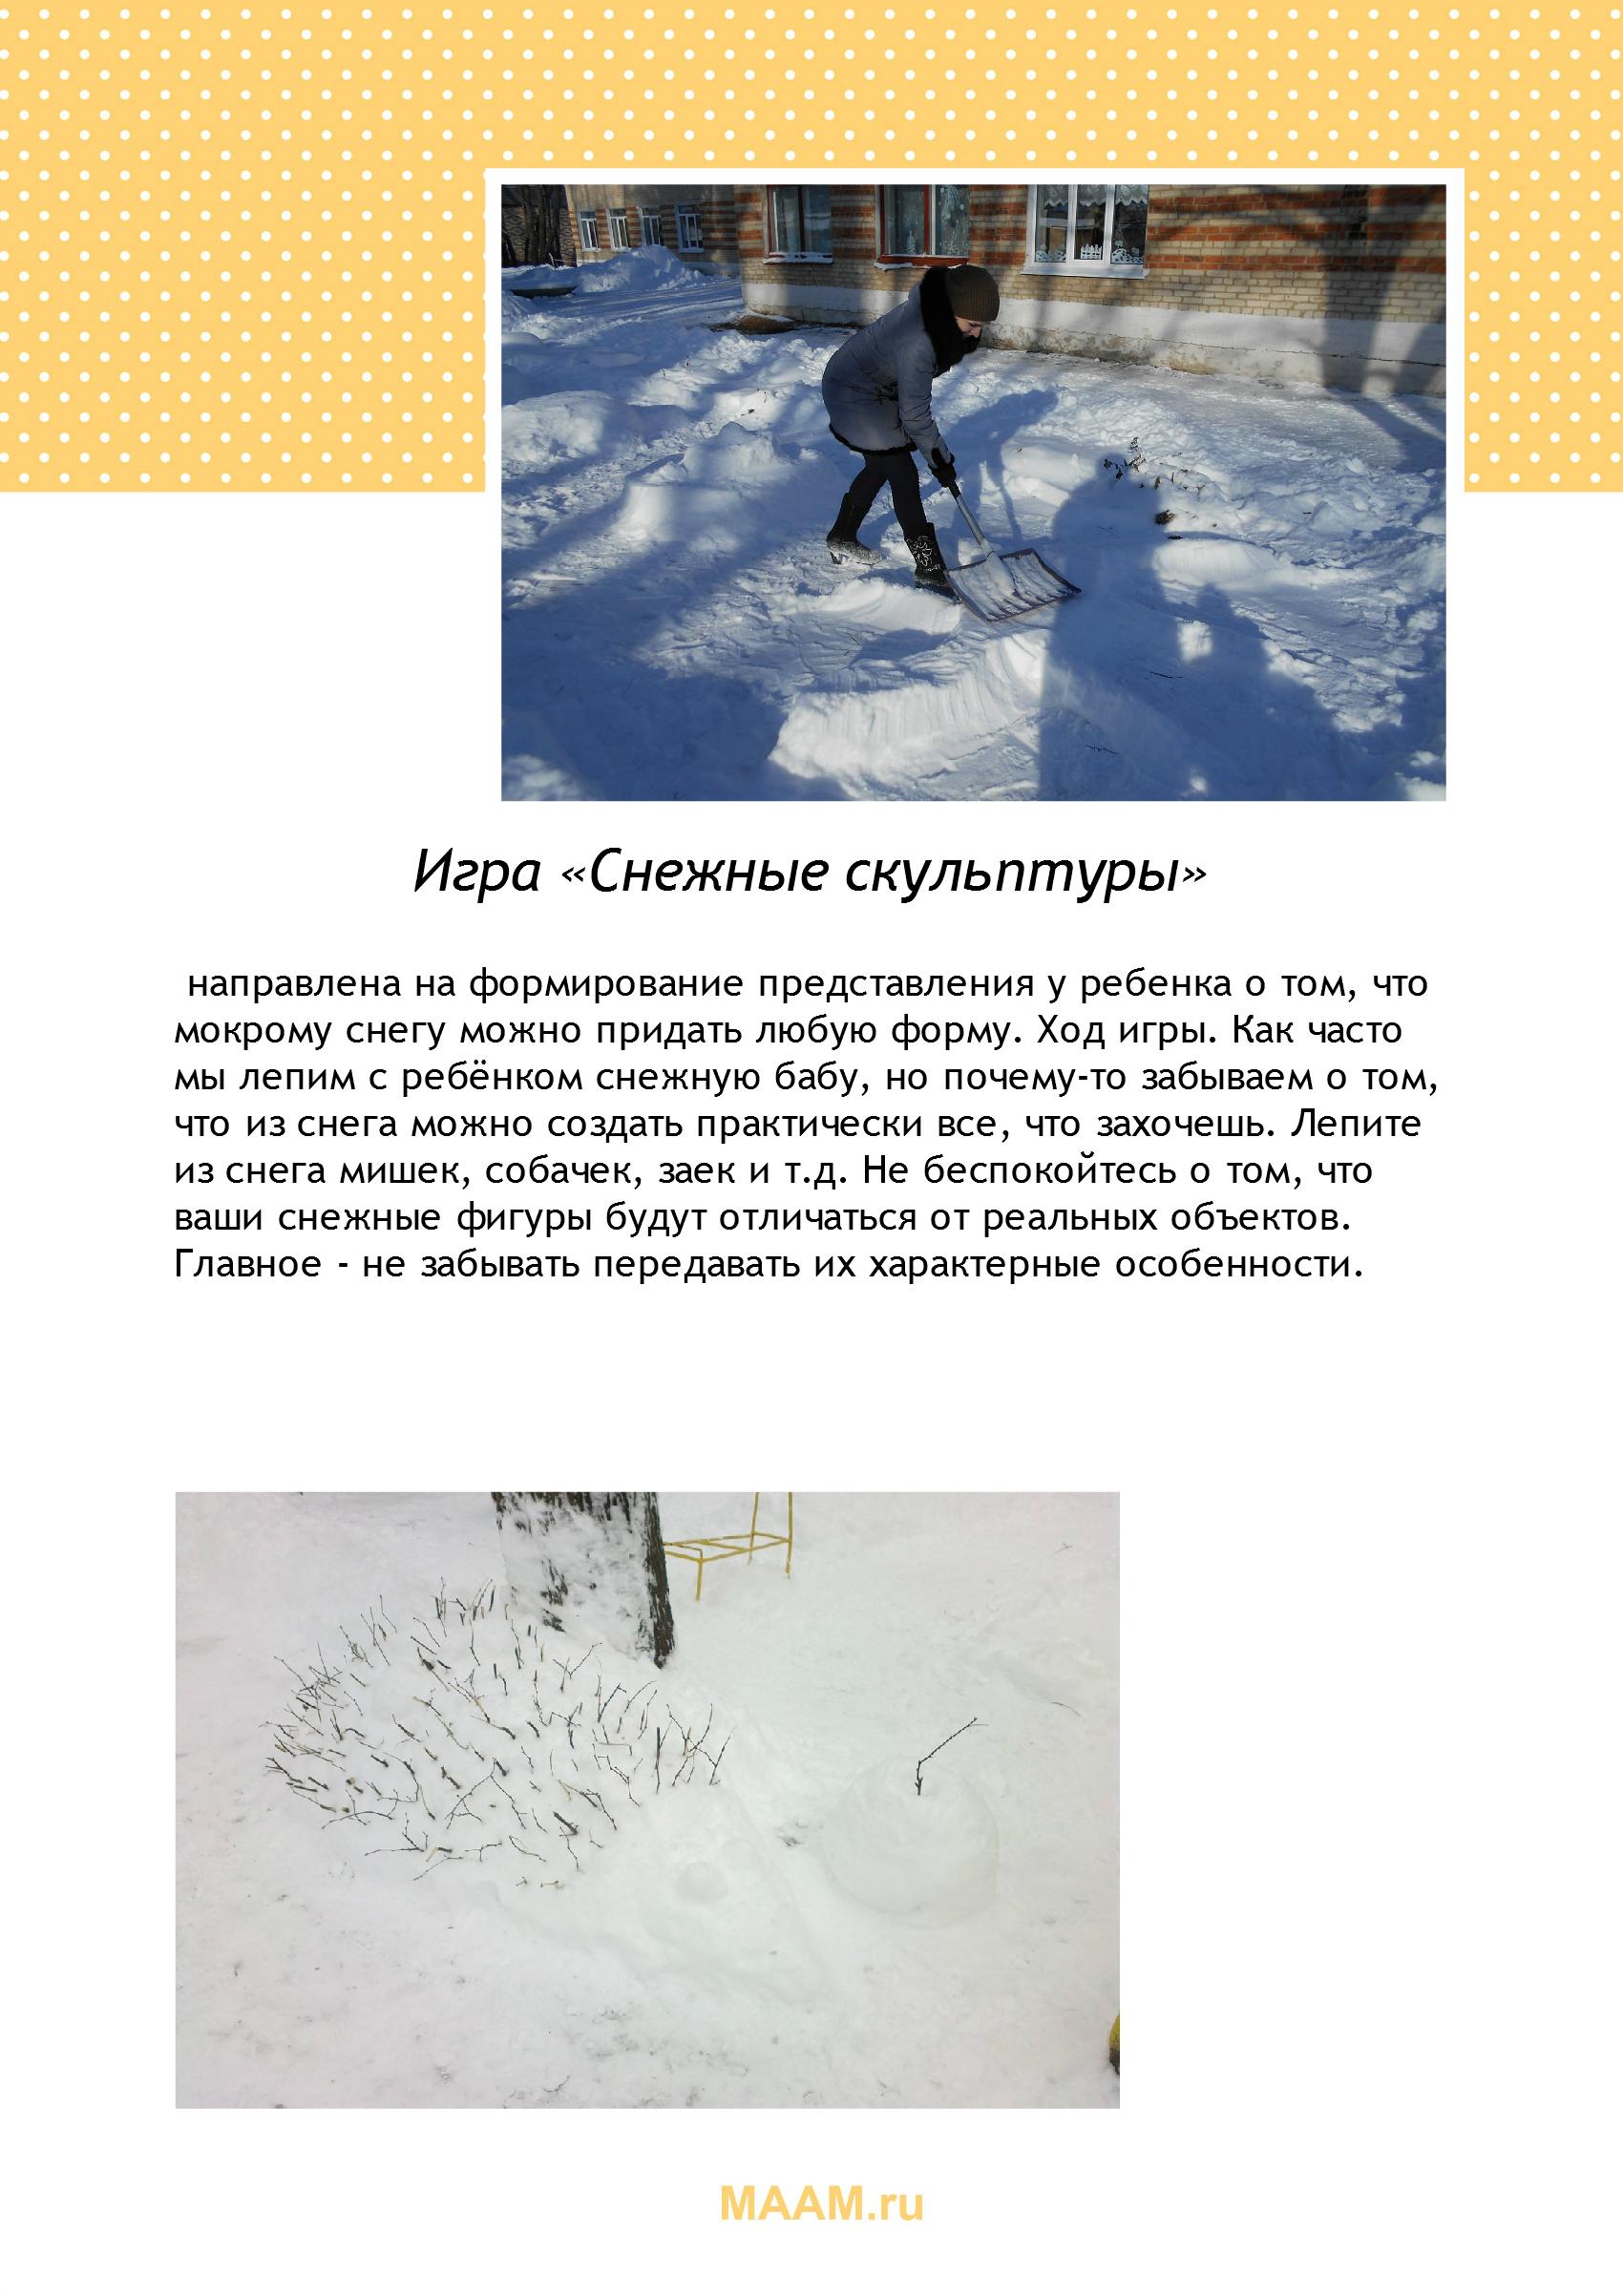 F:\аттестация\Готово\Проект снег\4.jpg